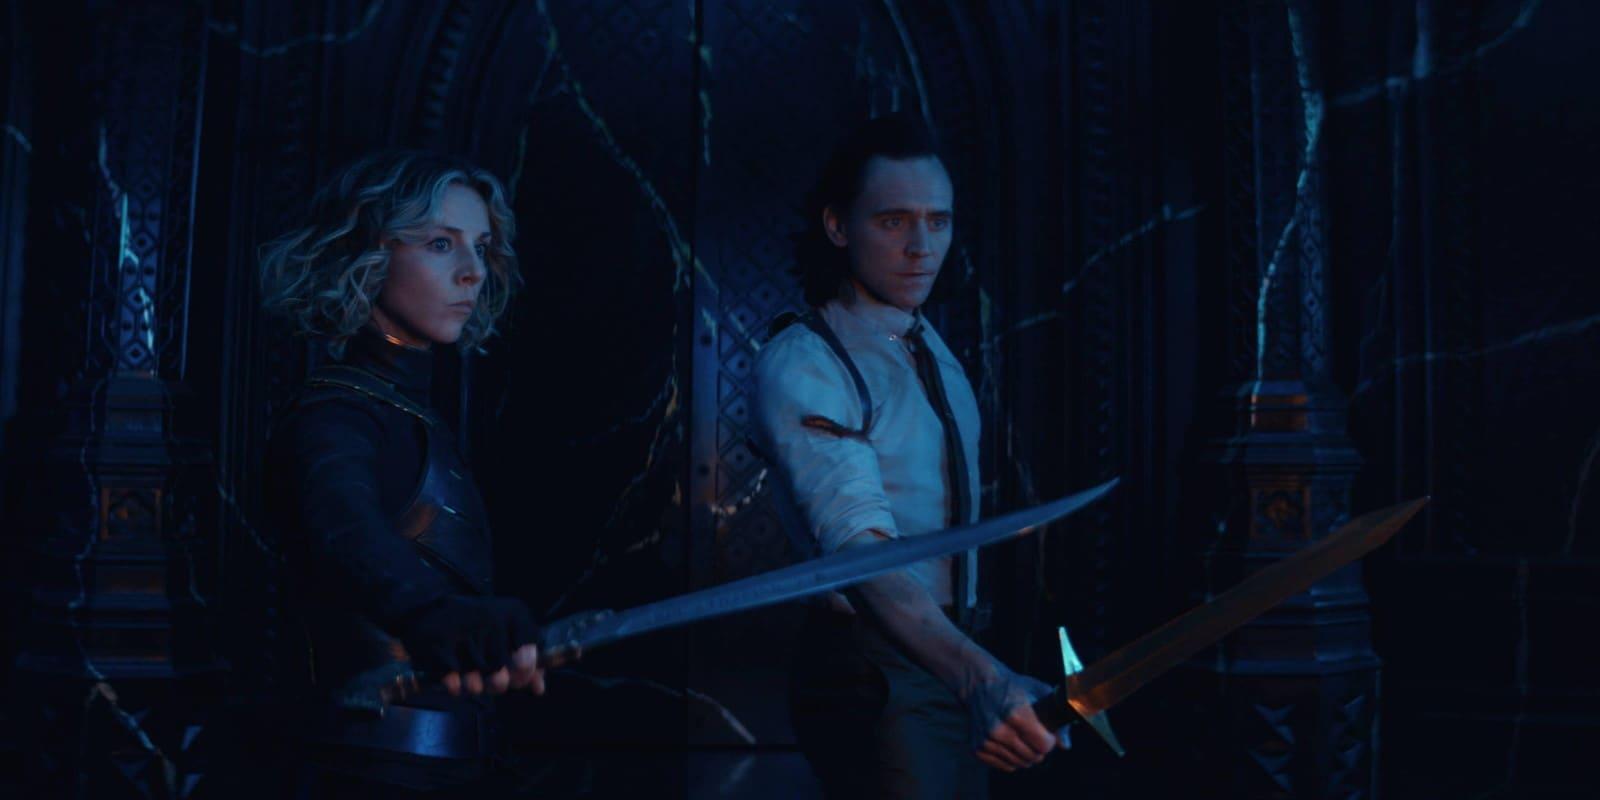 Episode 6 BSU Loki, Multiverse, and Marvel's Next Big Villain?